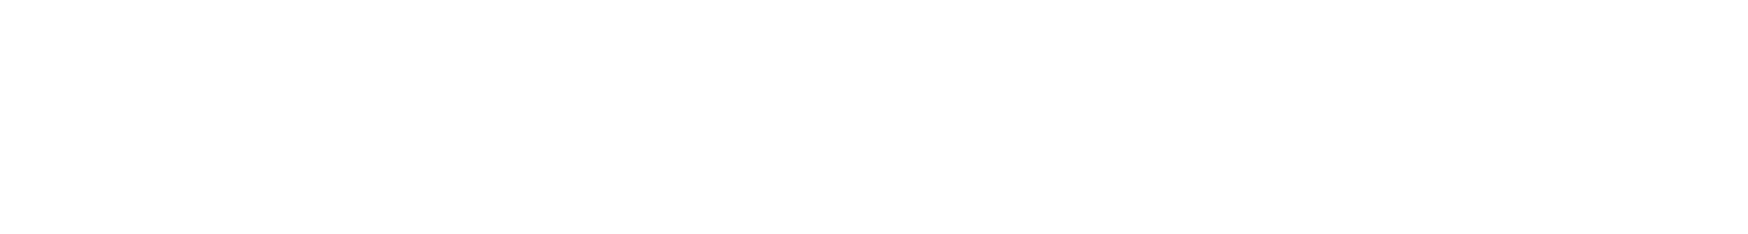 logo_concept_crop_02